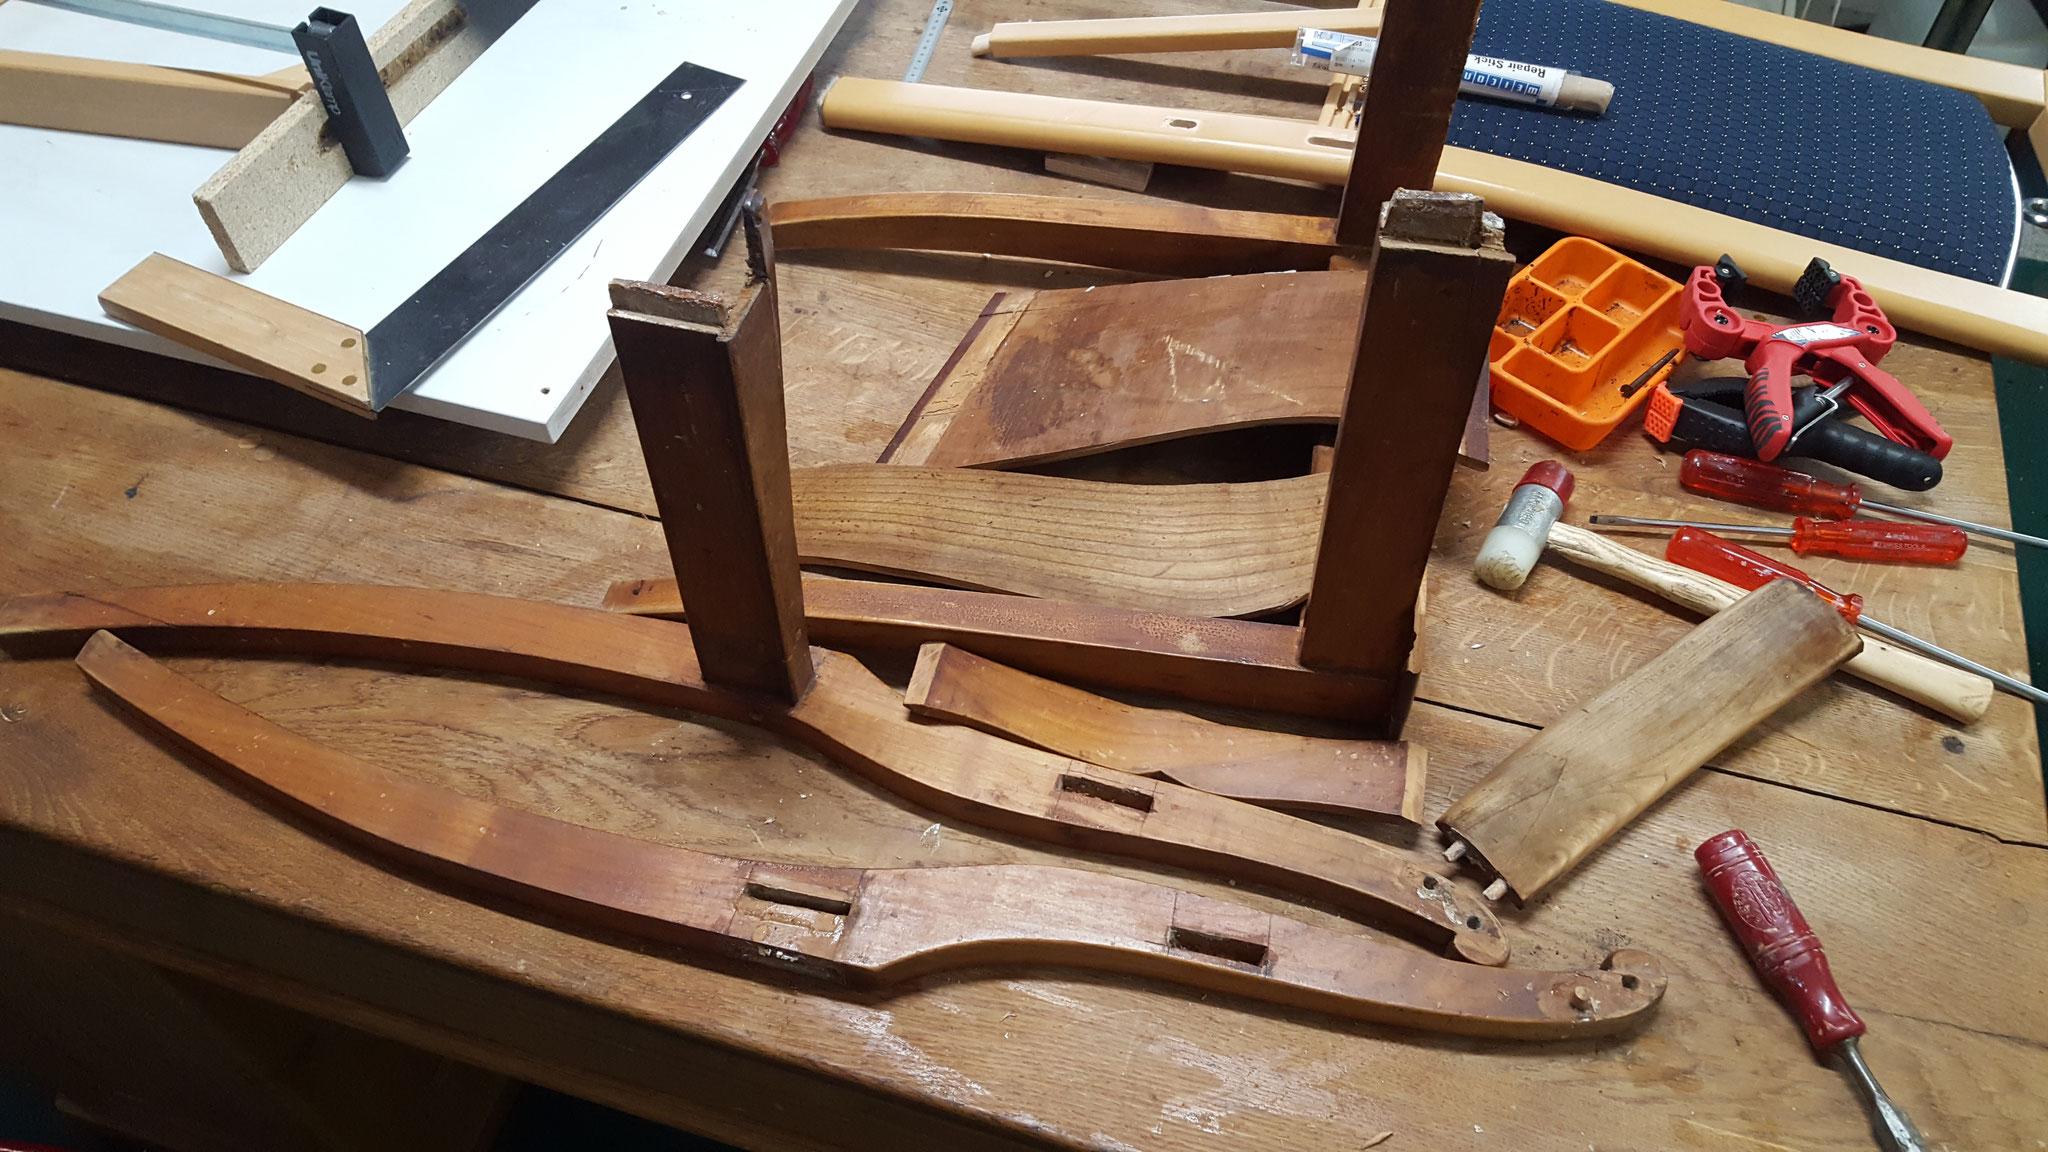 Holzstuhl zerlegt um neu zu verleimen